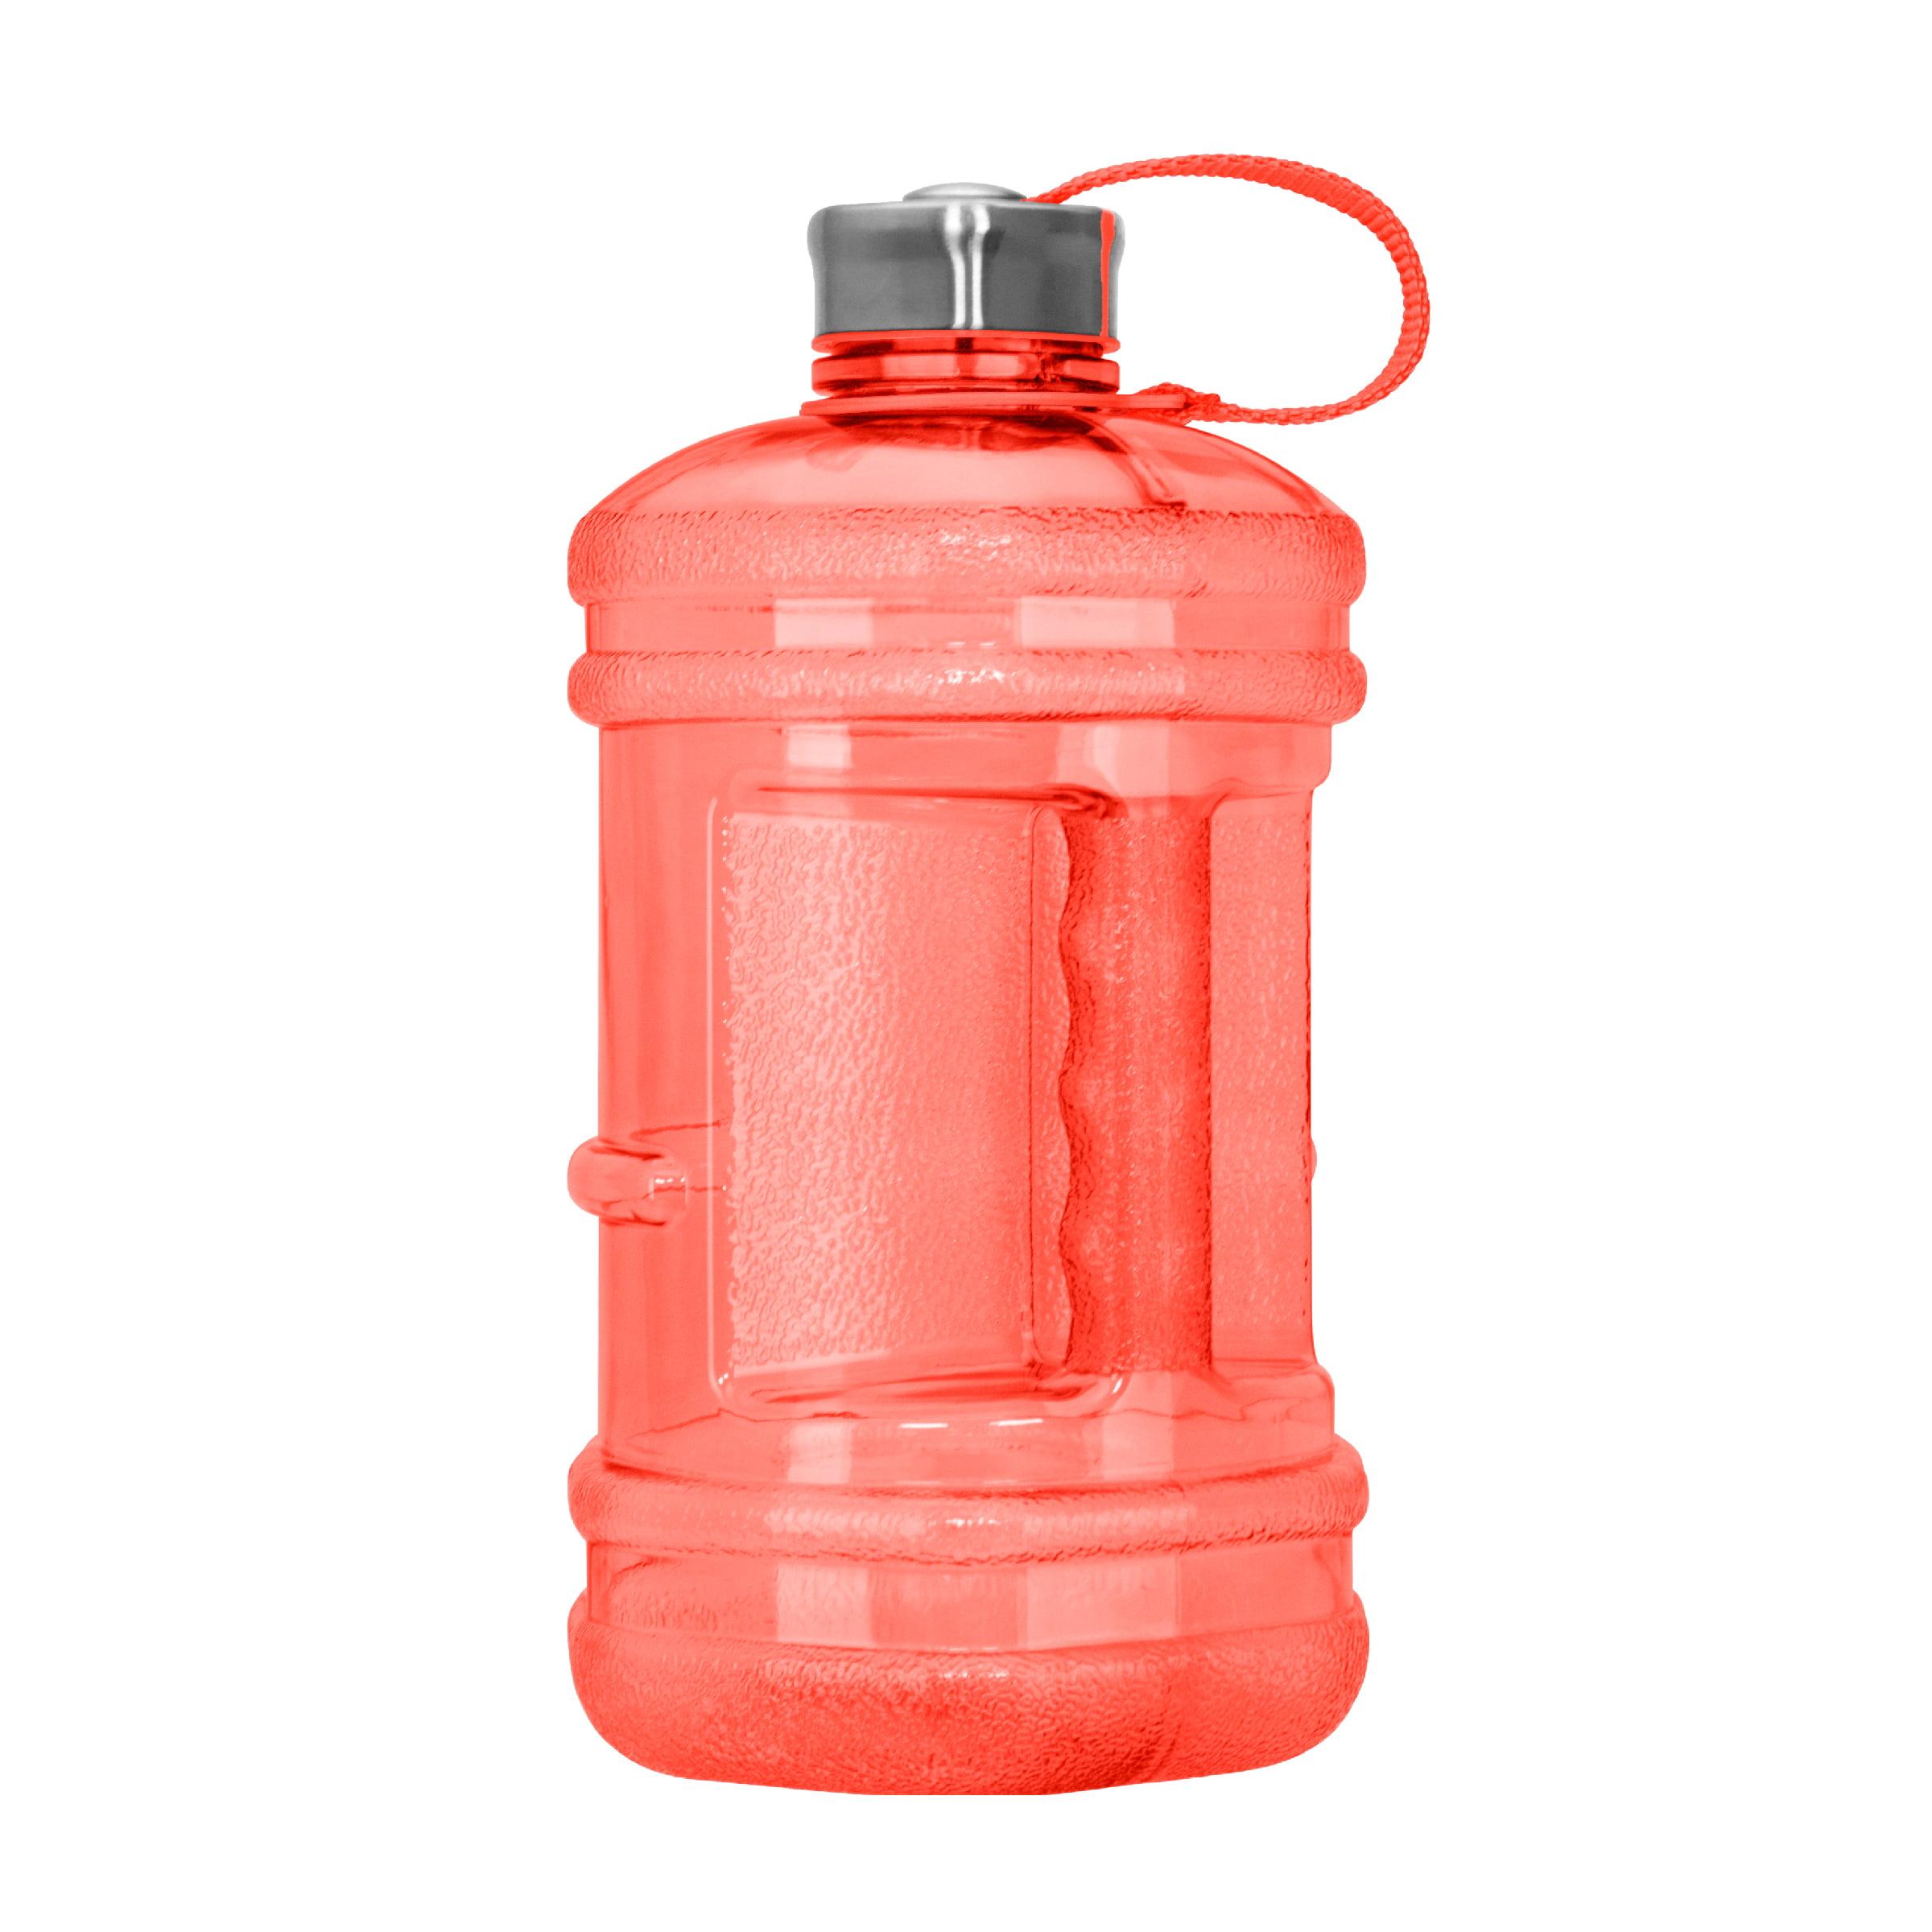 2.3 Liter (77 oz) BPA Free Hexagon Drinking Water Bottle w/48mm Steel Cap (Red)